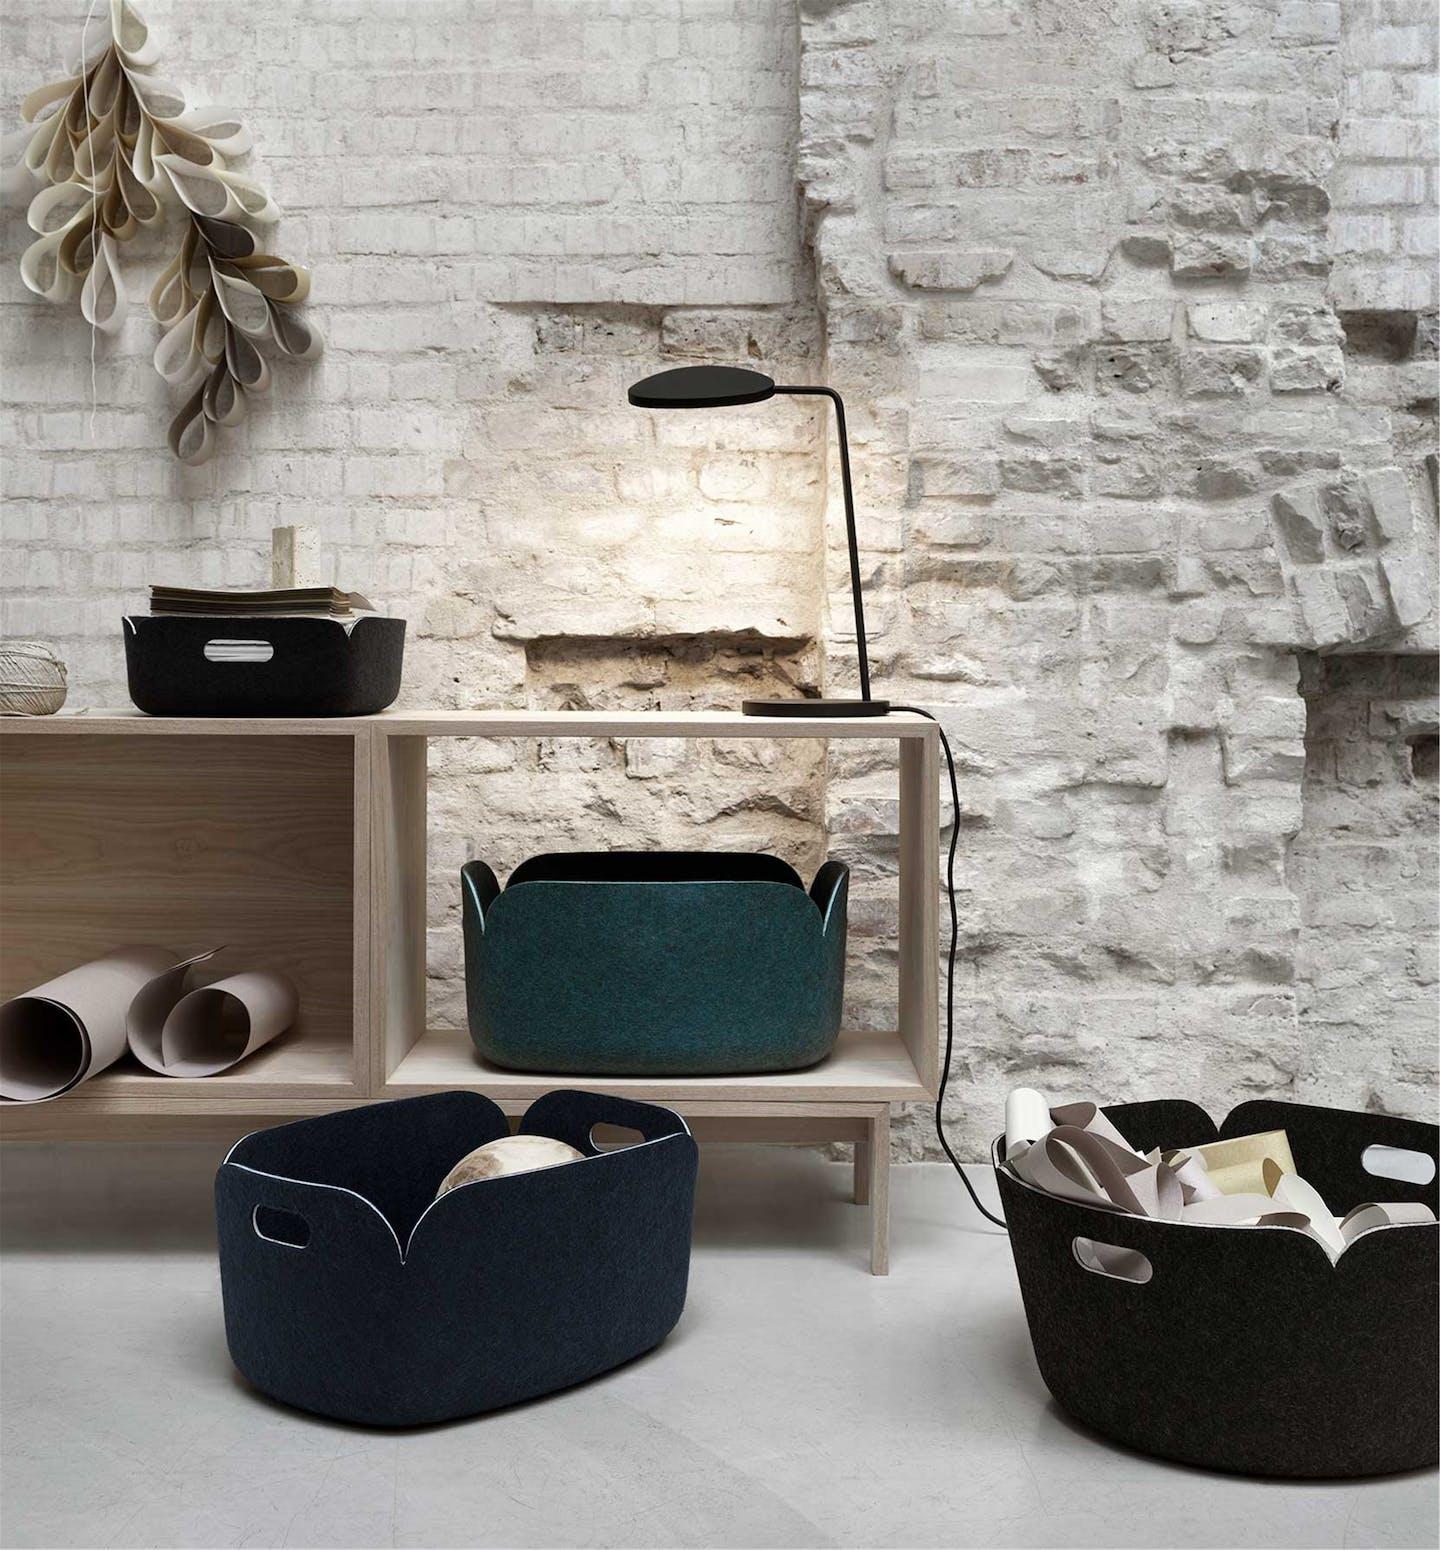 muuto restore basket sustainable design